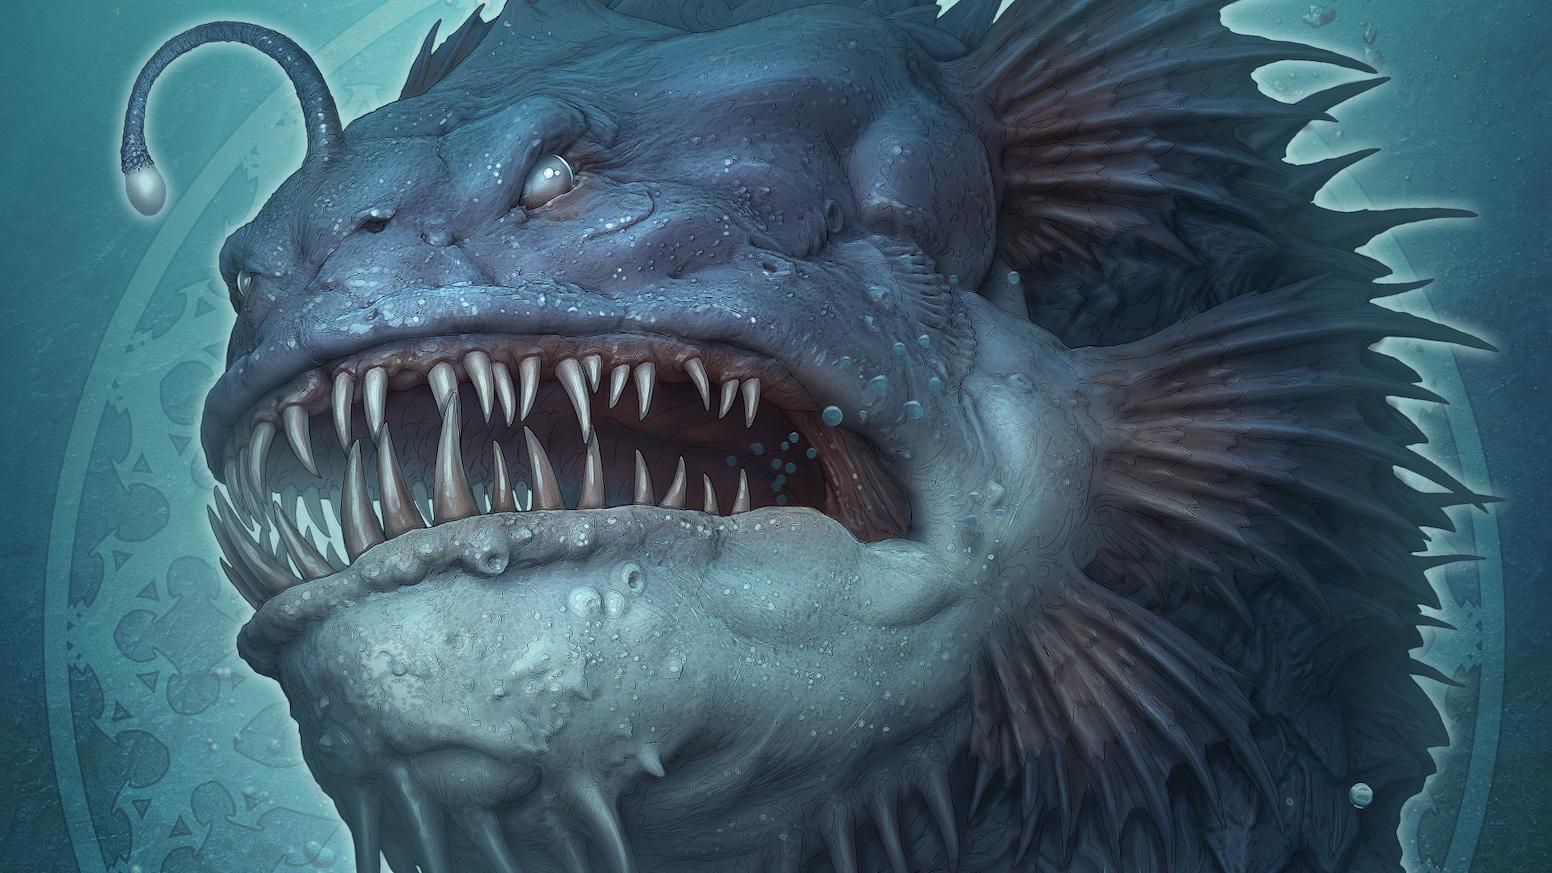 the deep sea blood ice dragons by kerem beyit by robert burke